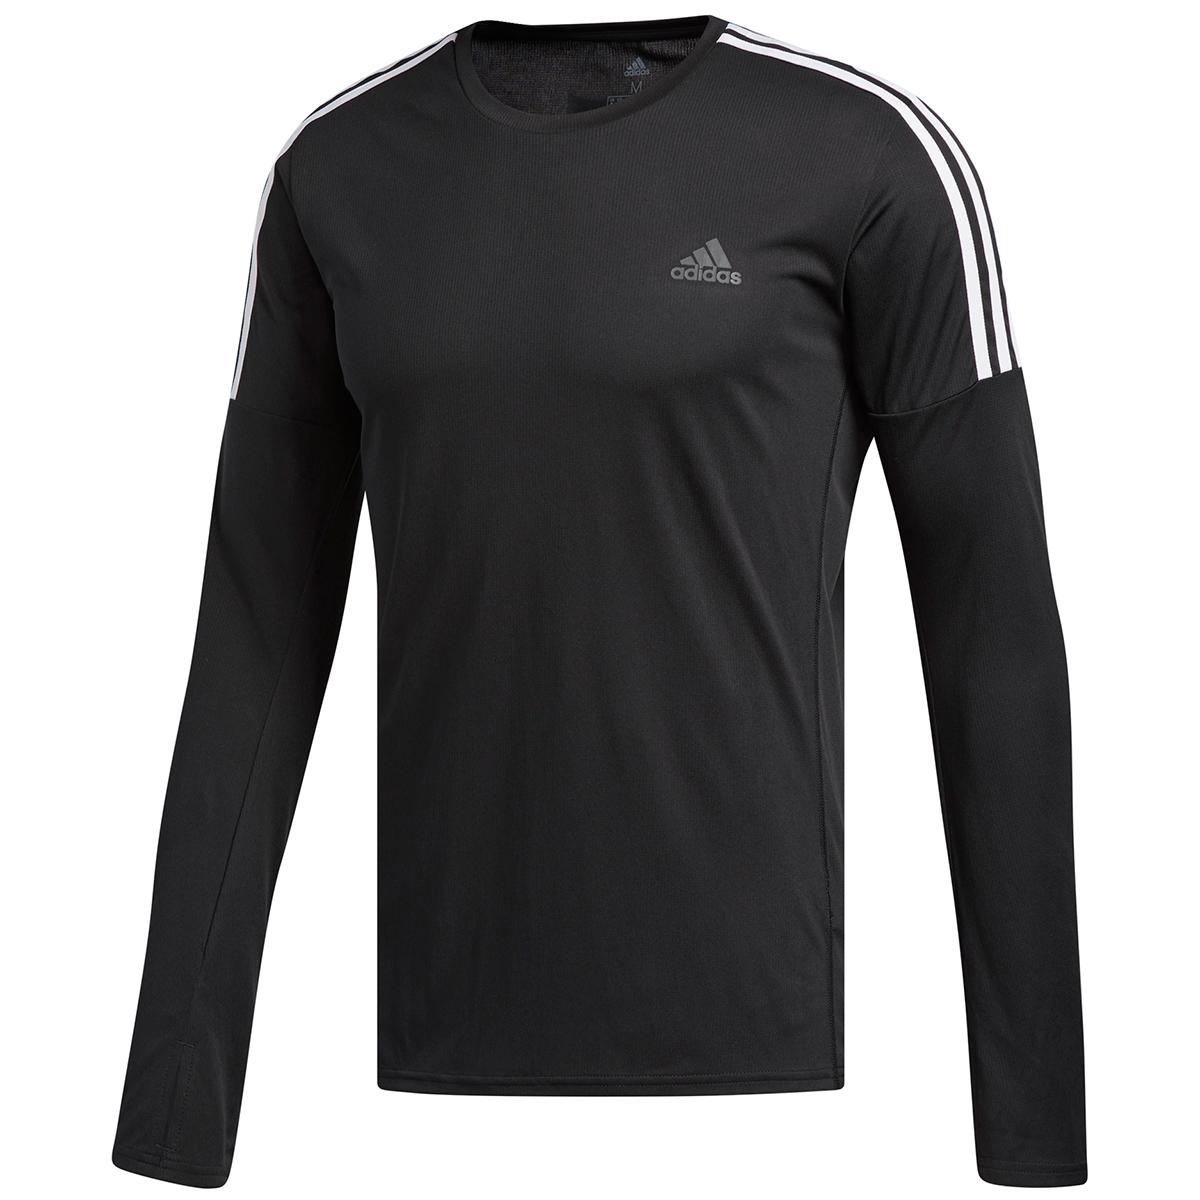 Adidas Men's 3-Stripes Long-Sleeve Running Tee - Black, XL